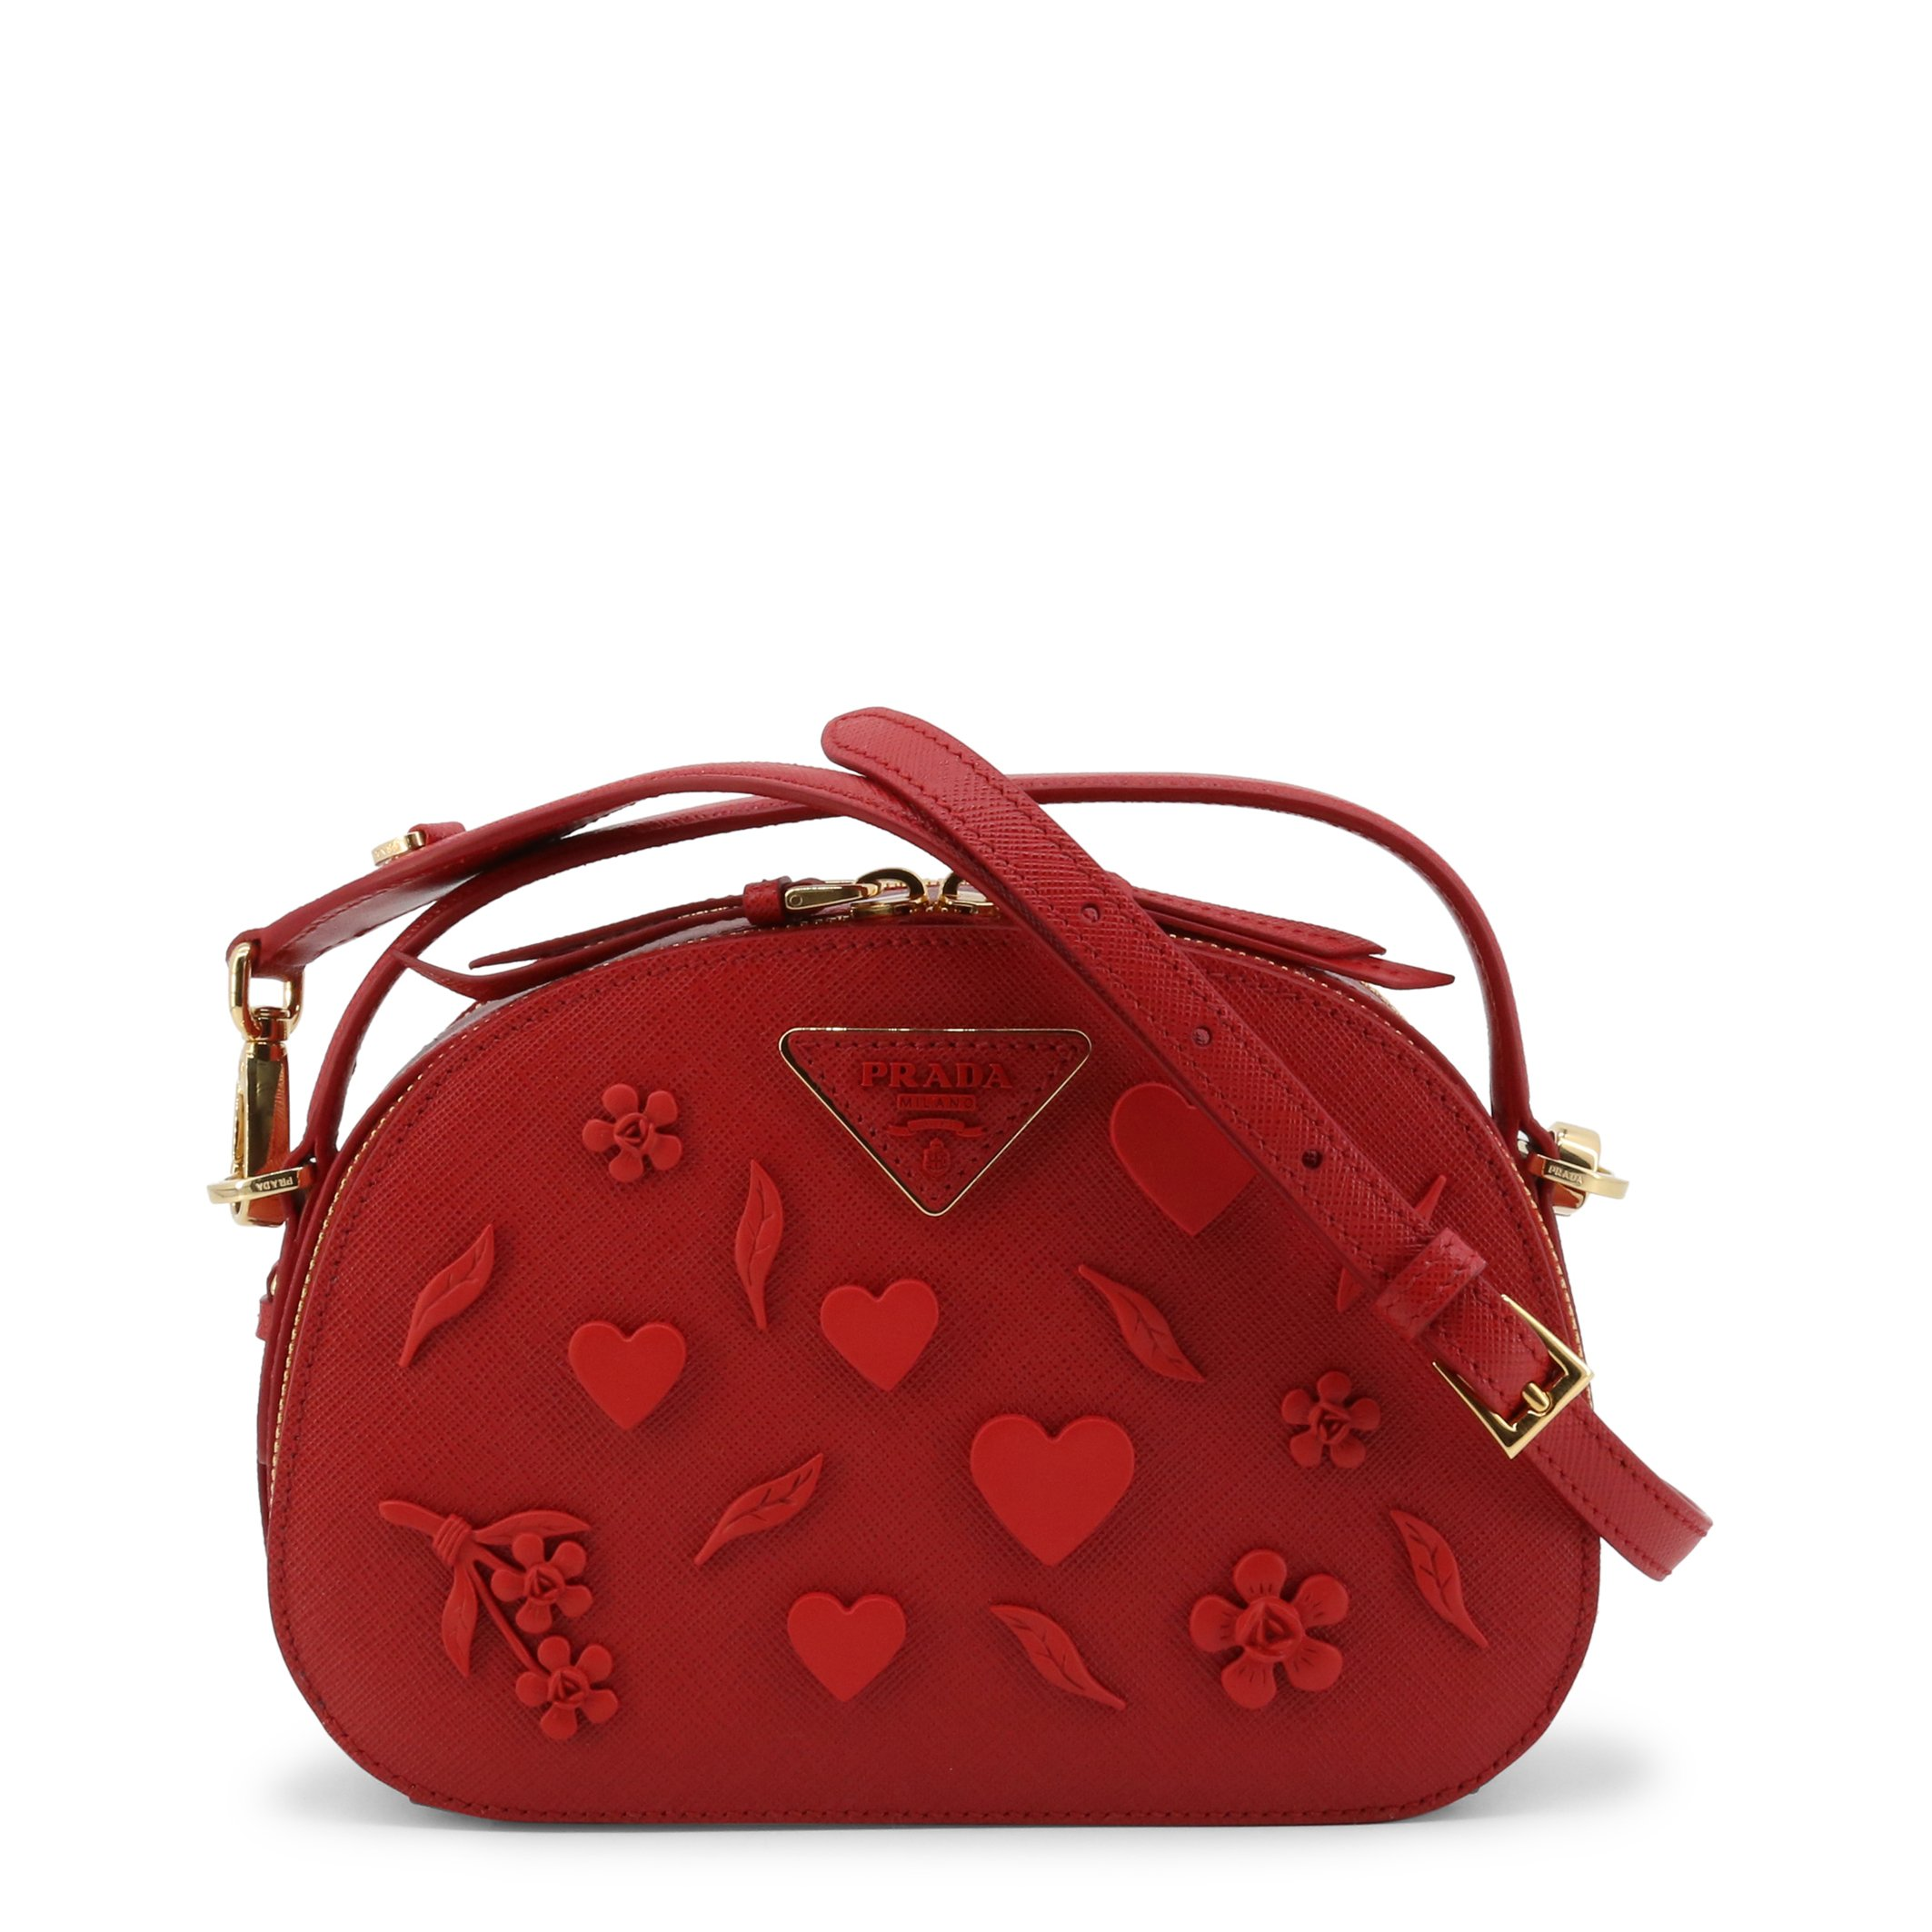 Prada Women's Handbag Various Colours 1BH123_NZV - red NOSIZE